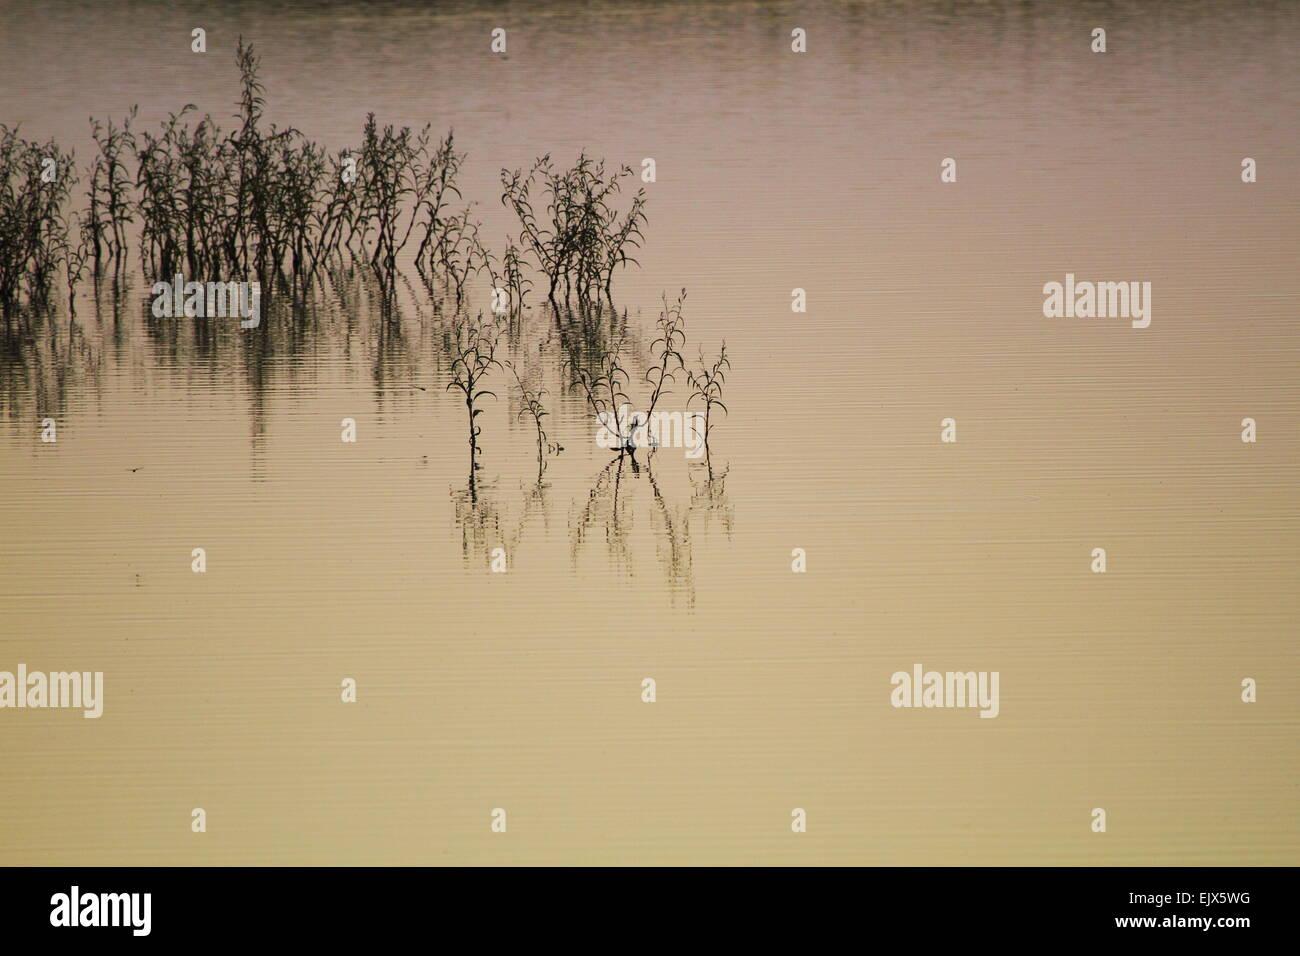 Plants reflect on a placid rural pond near Breeza, NSW, Australia. - Stock Image